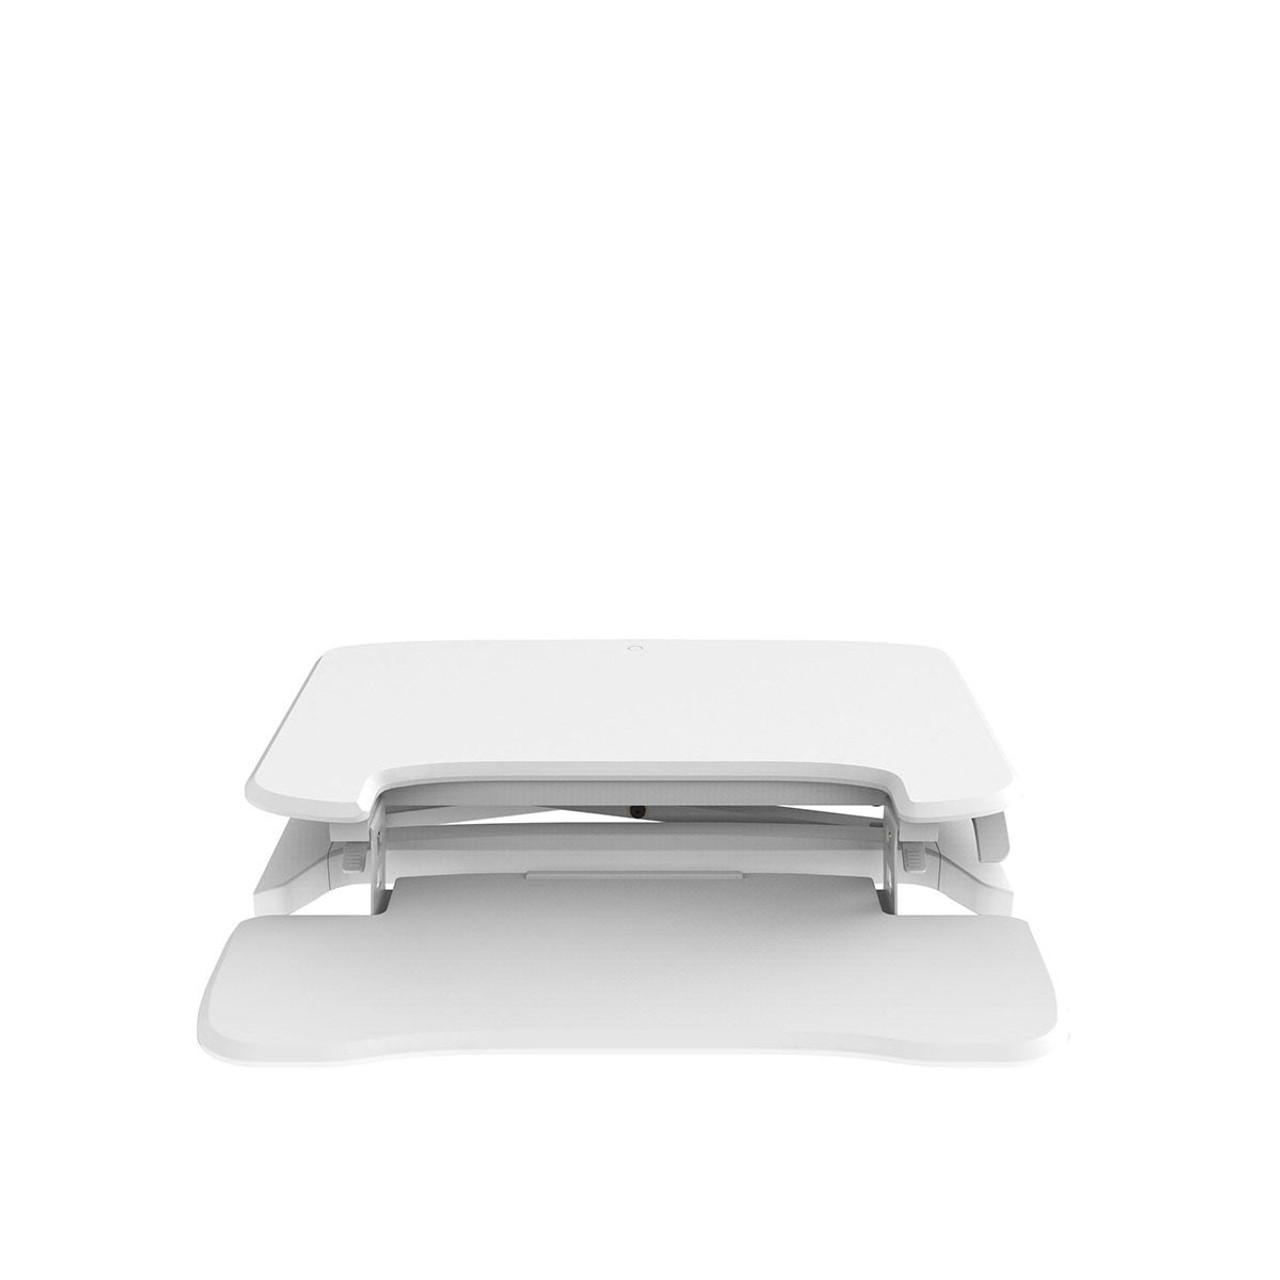 EFurnit Standing Desk Riser/Converter - Convert your Desk to a Height Adjustable Sit Stand Workstation- Series 151-White